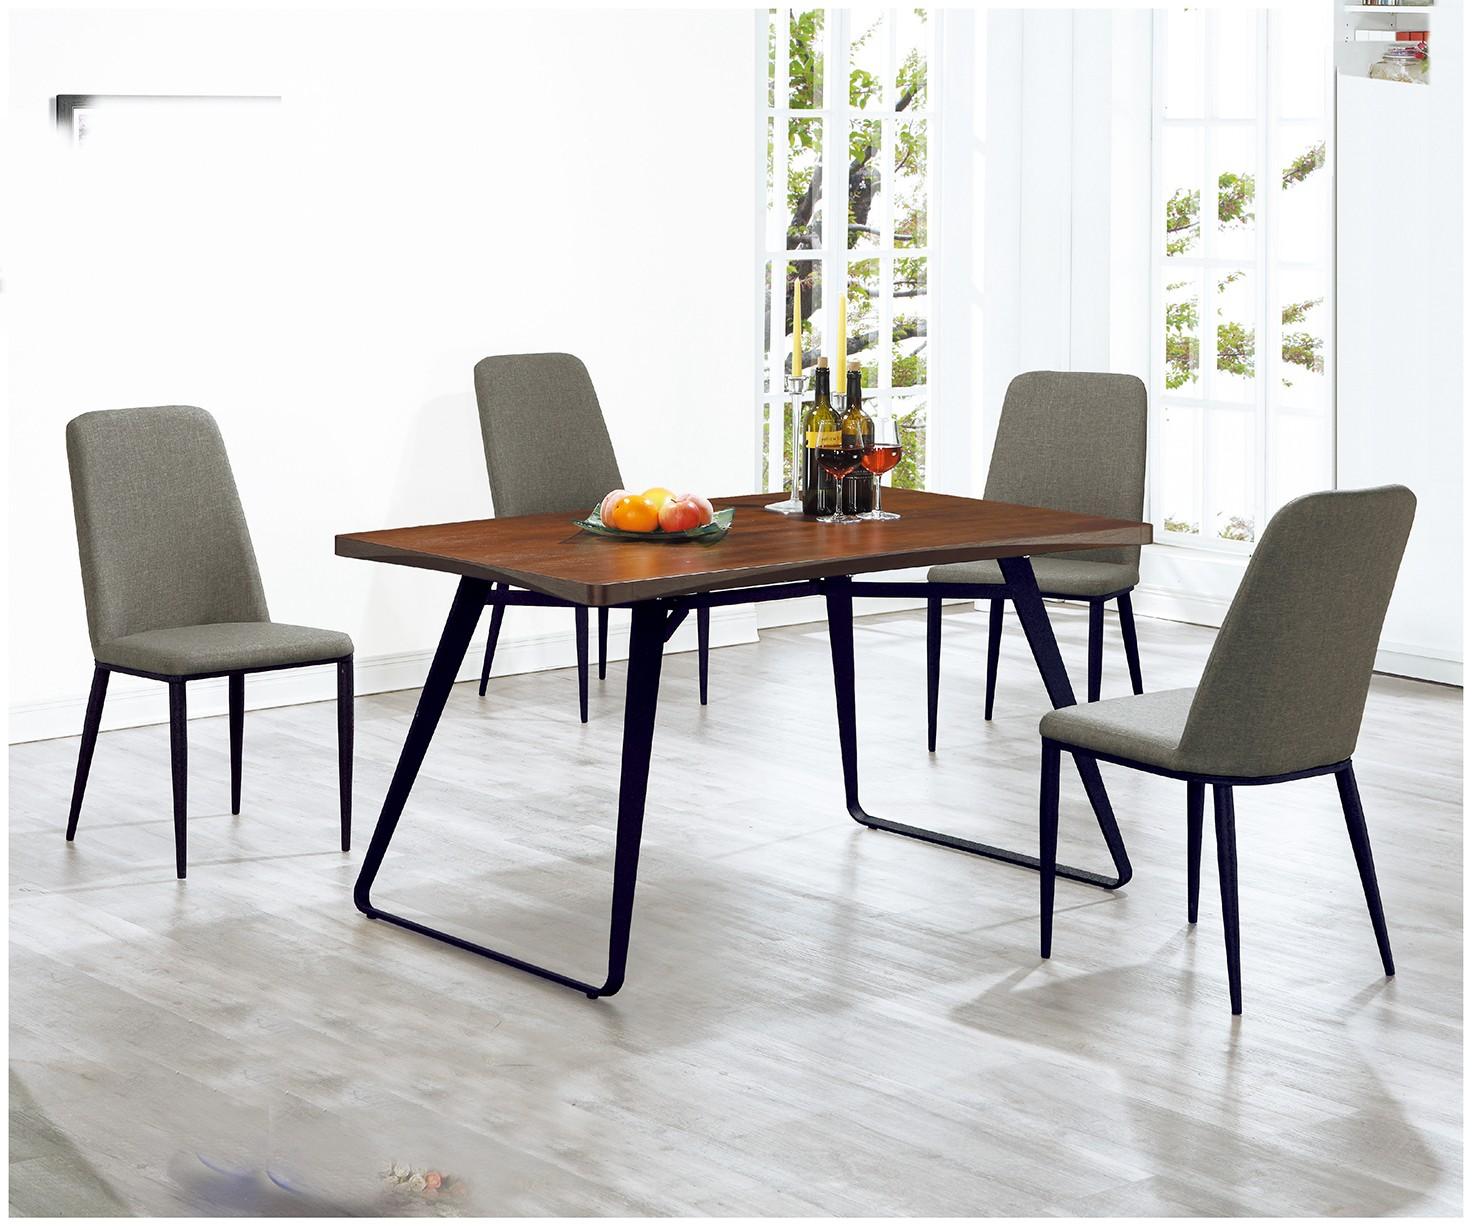 (A68)4.3尺餐桌椅(1桌4椅)